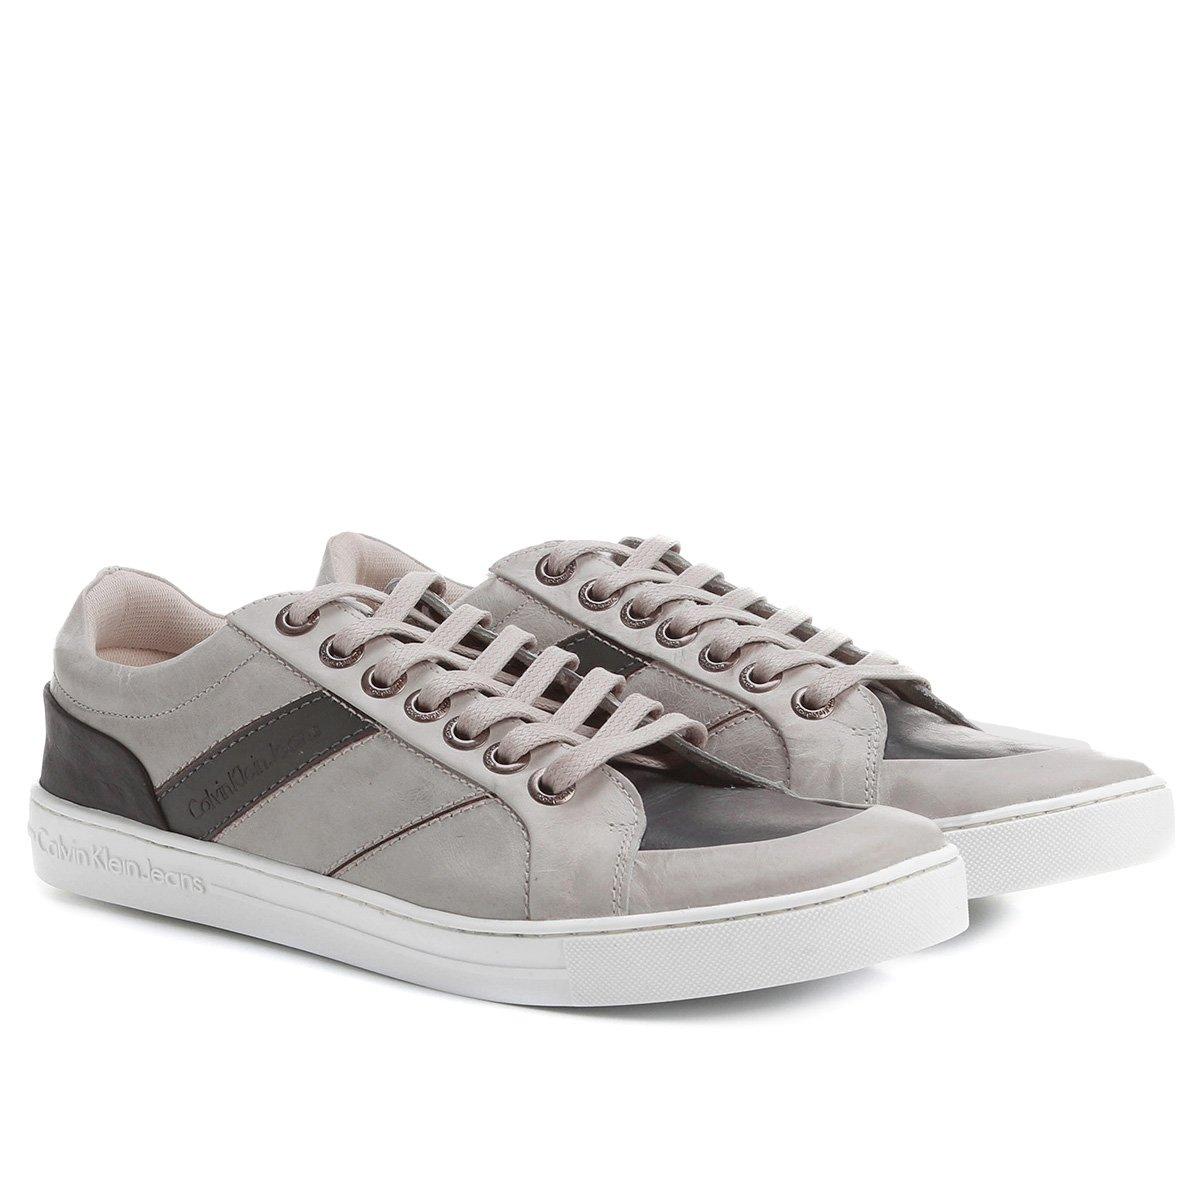 13671955cbff1 FornecedorNetshoes. Tênis Couro Calvin Klein Cano Baixo Masculino